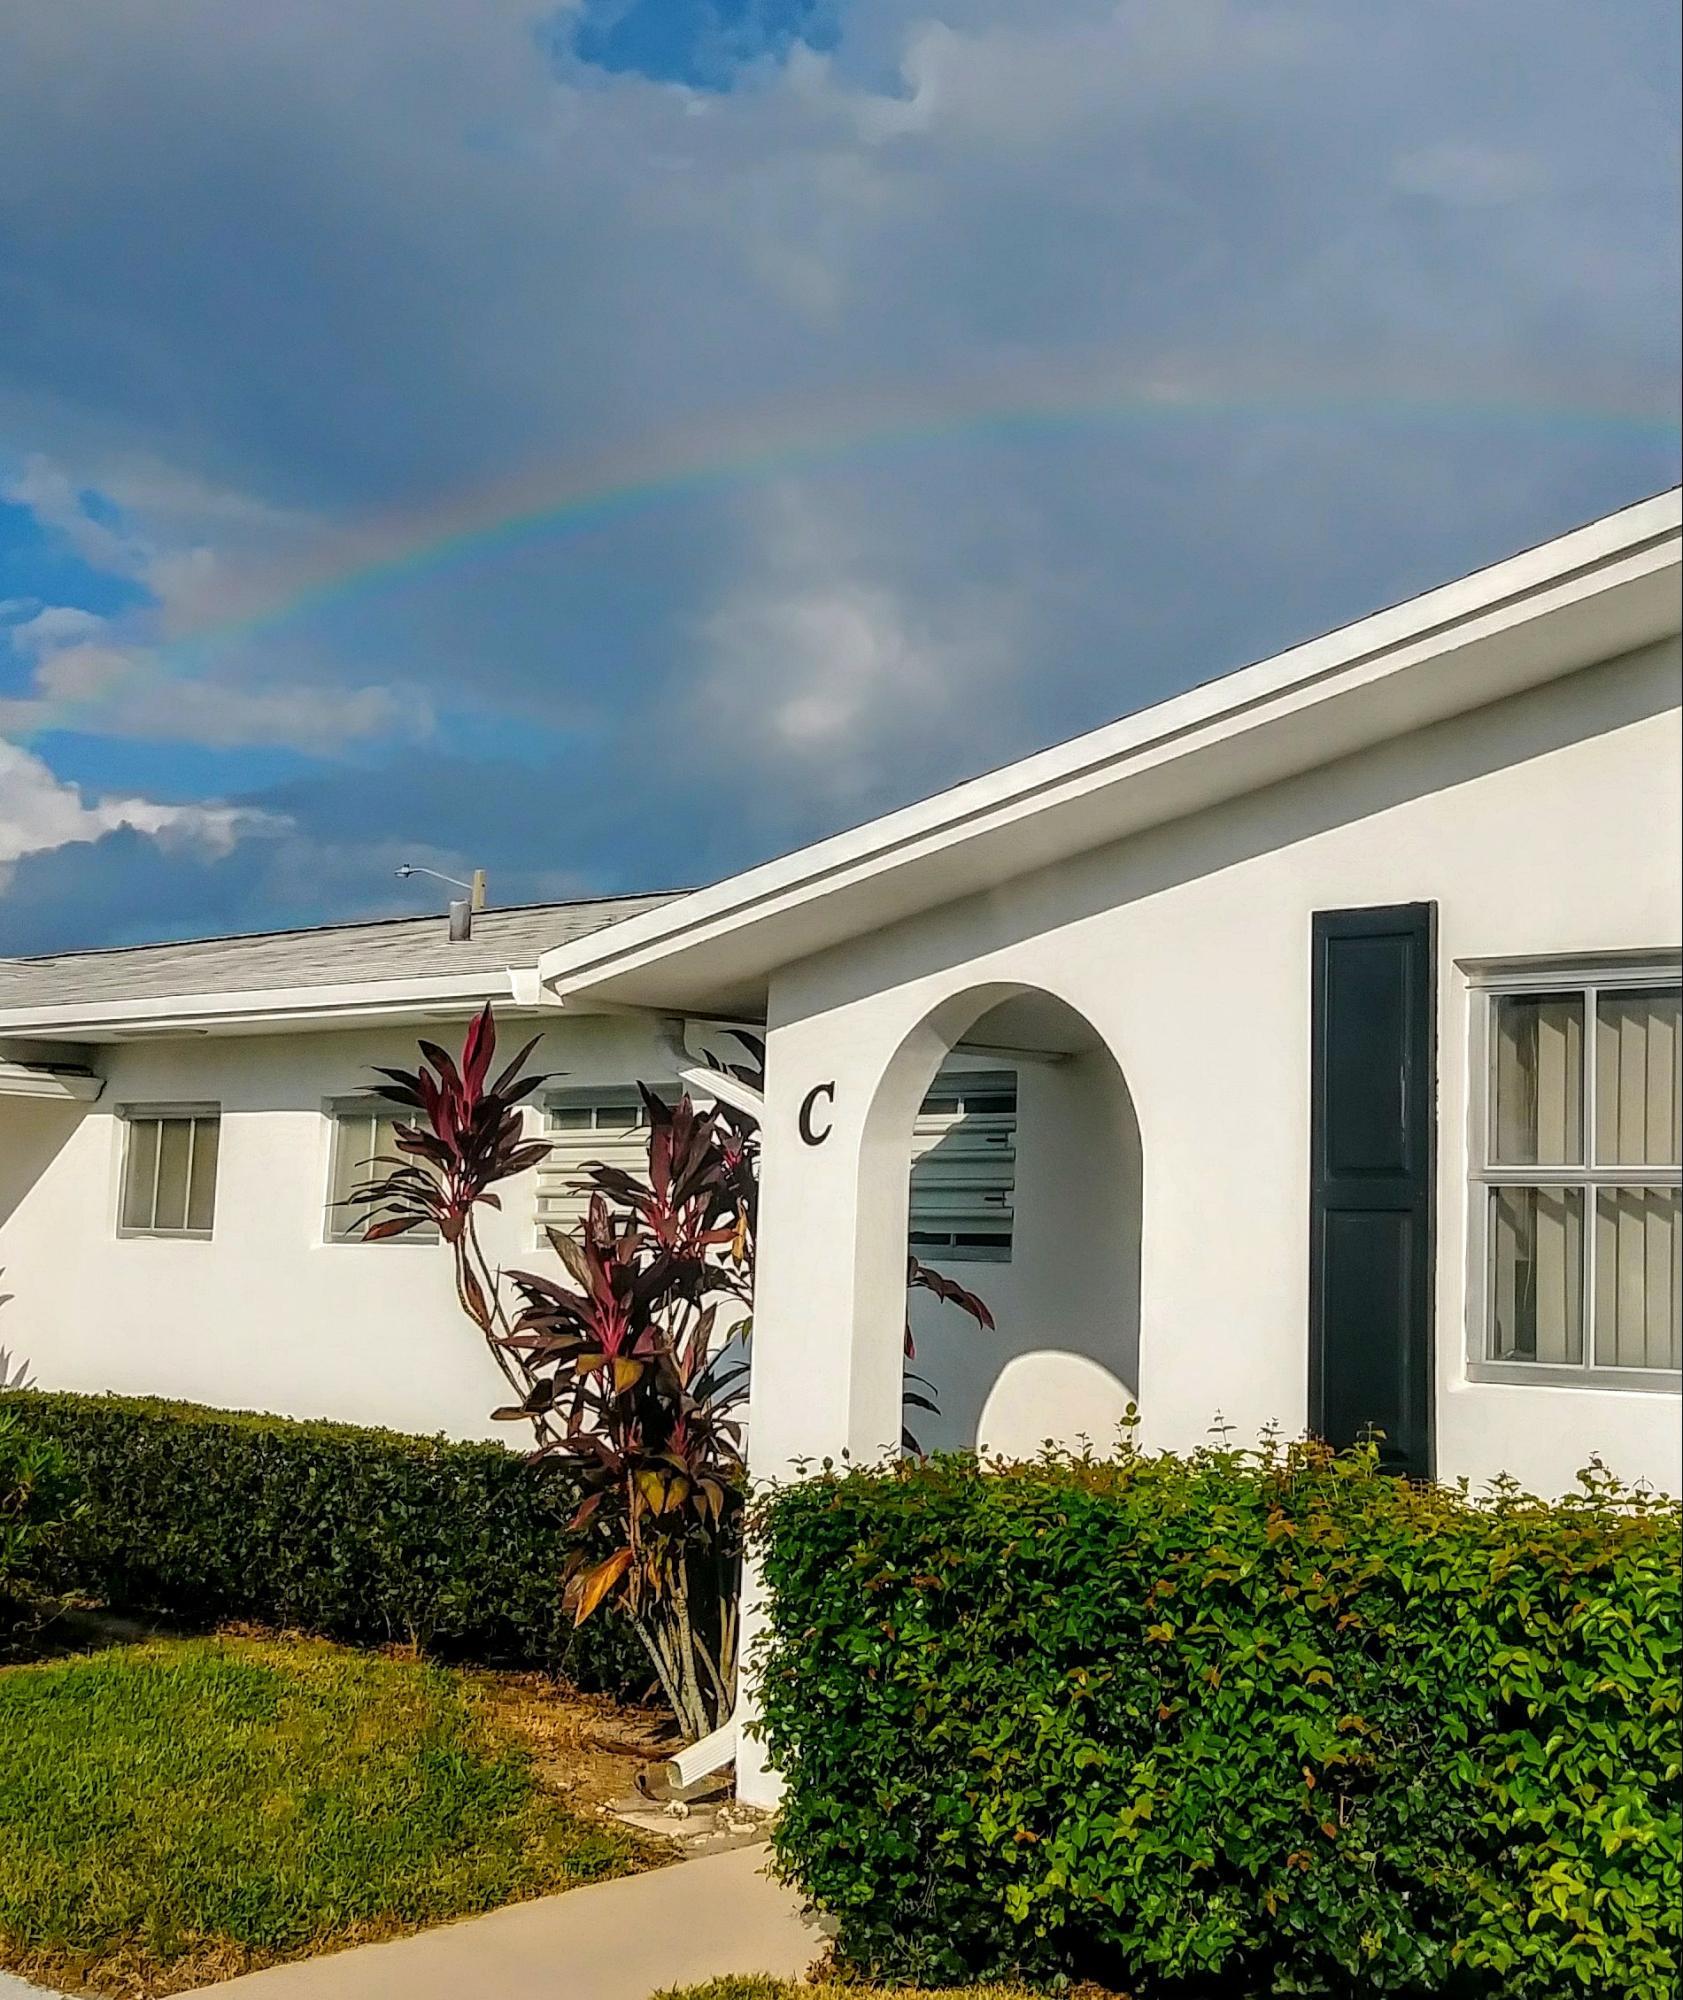 Photo of 2930 Crosley Drive E #C, West Palm Beach, FL 33415